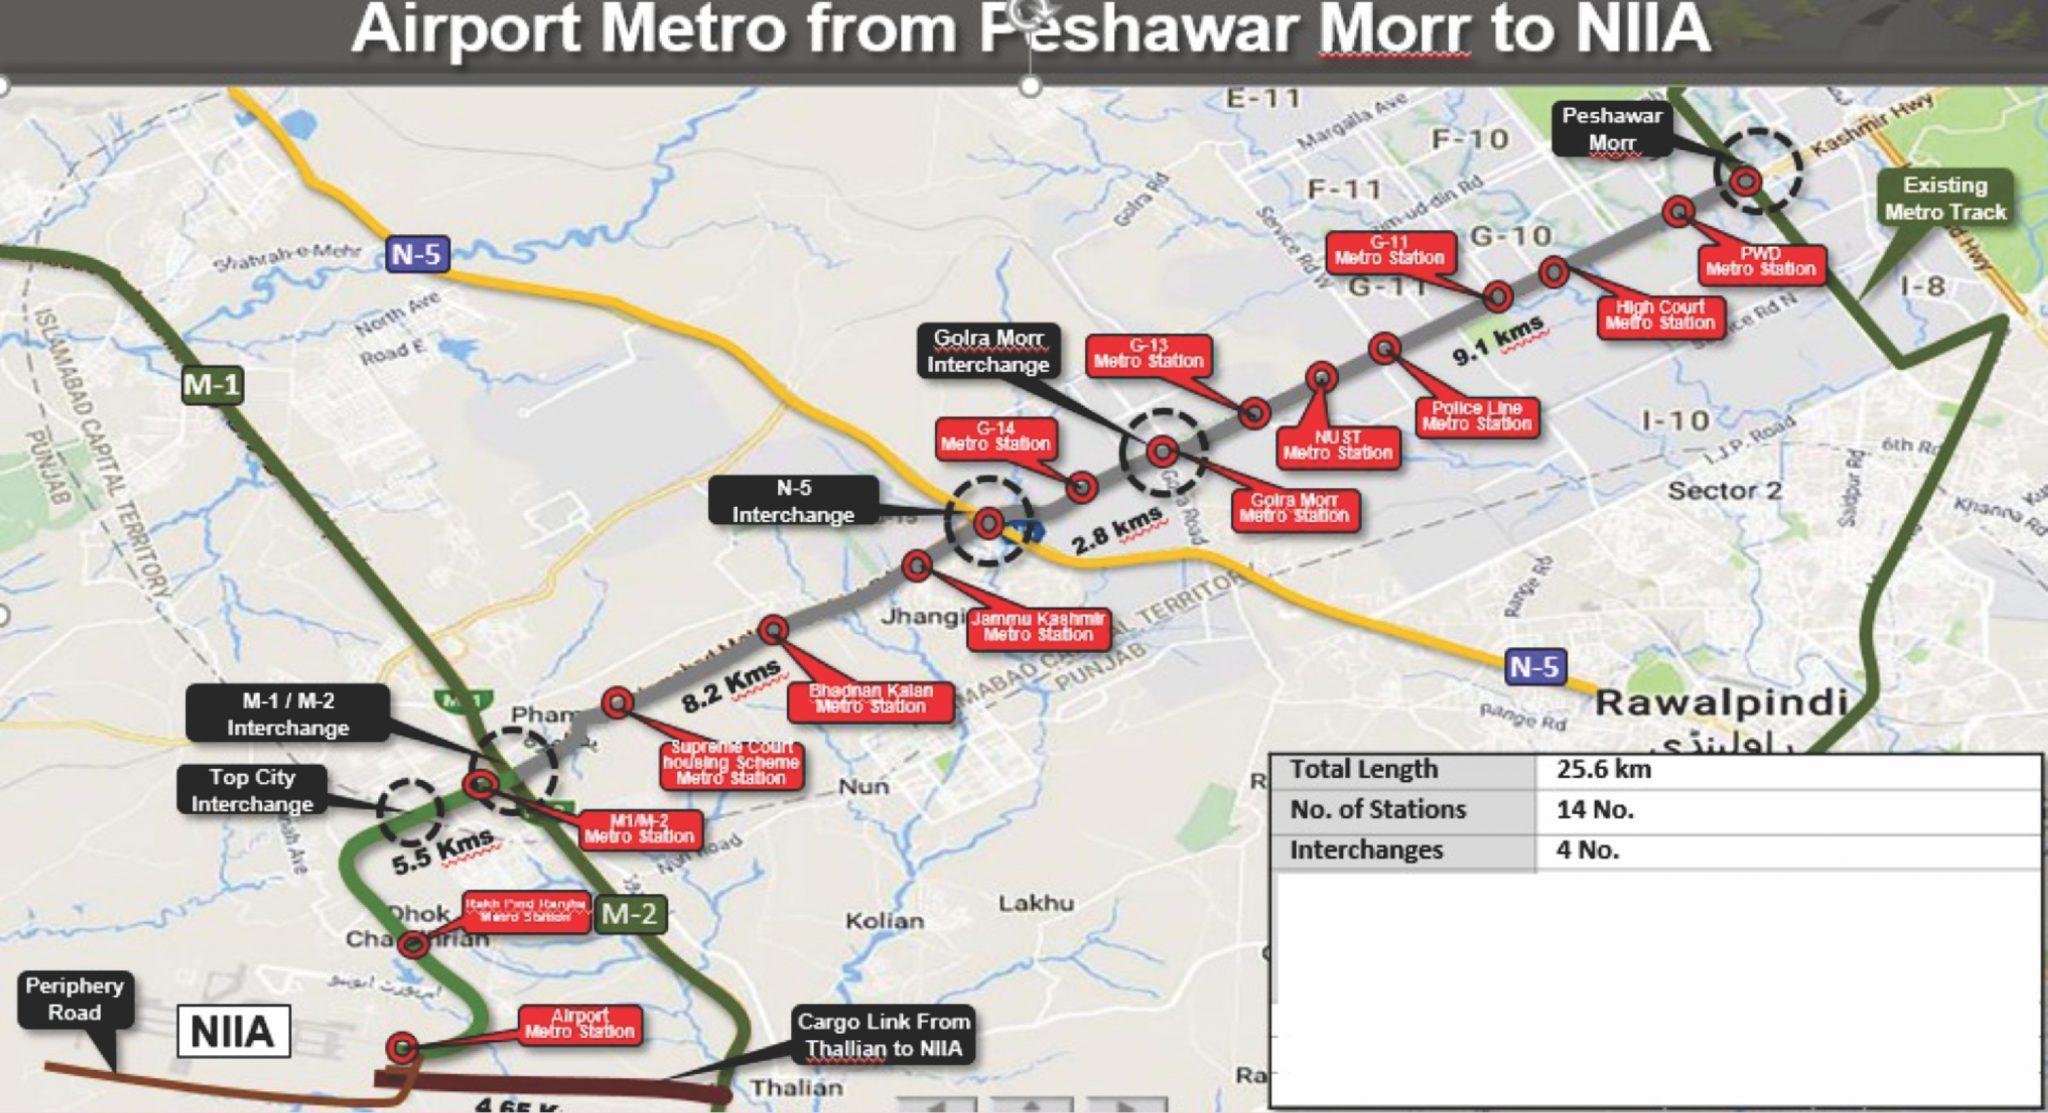 New Airport Metro Route